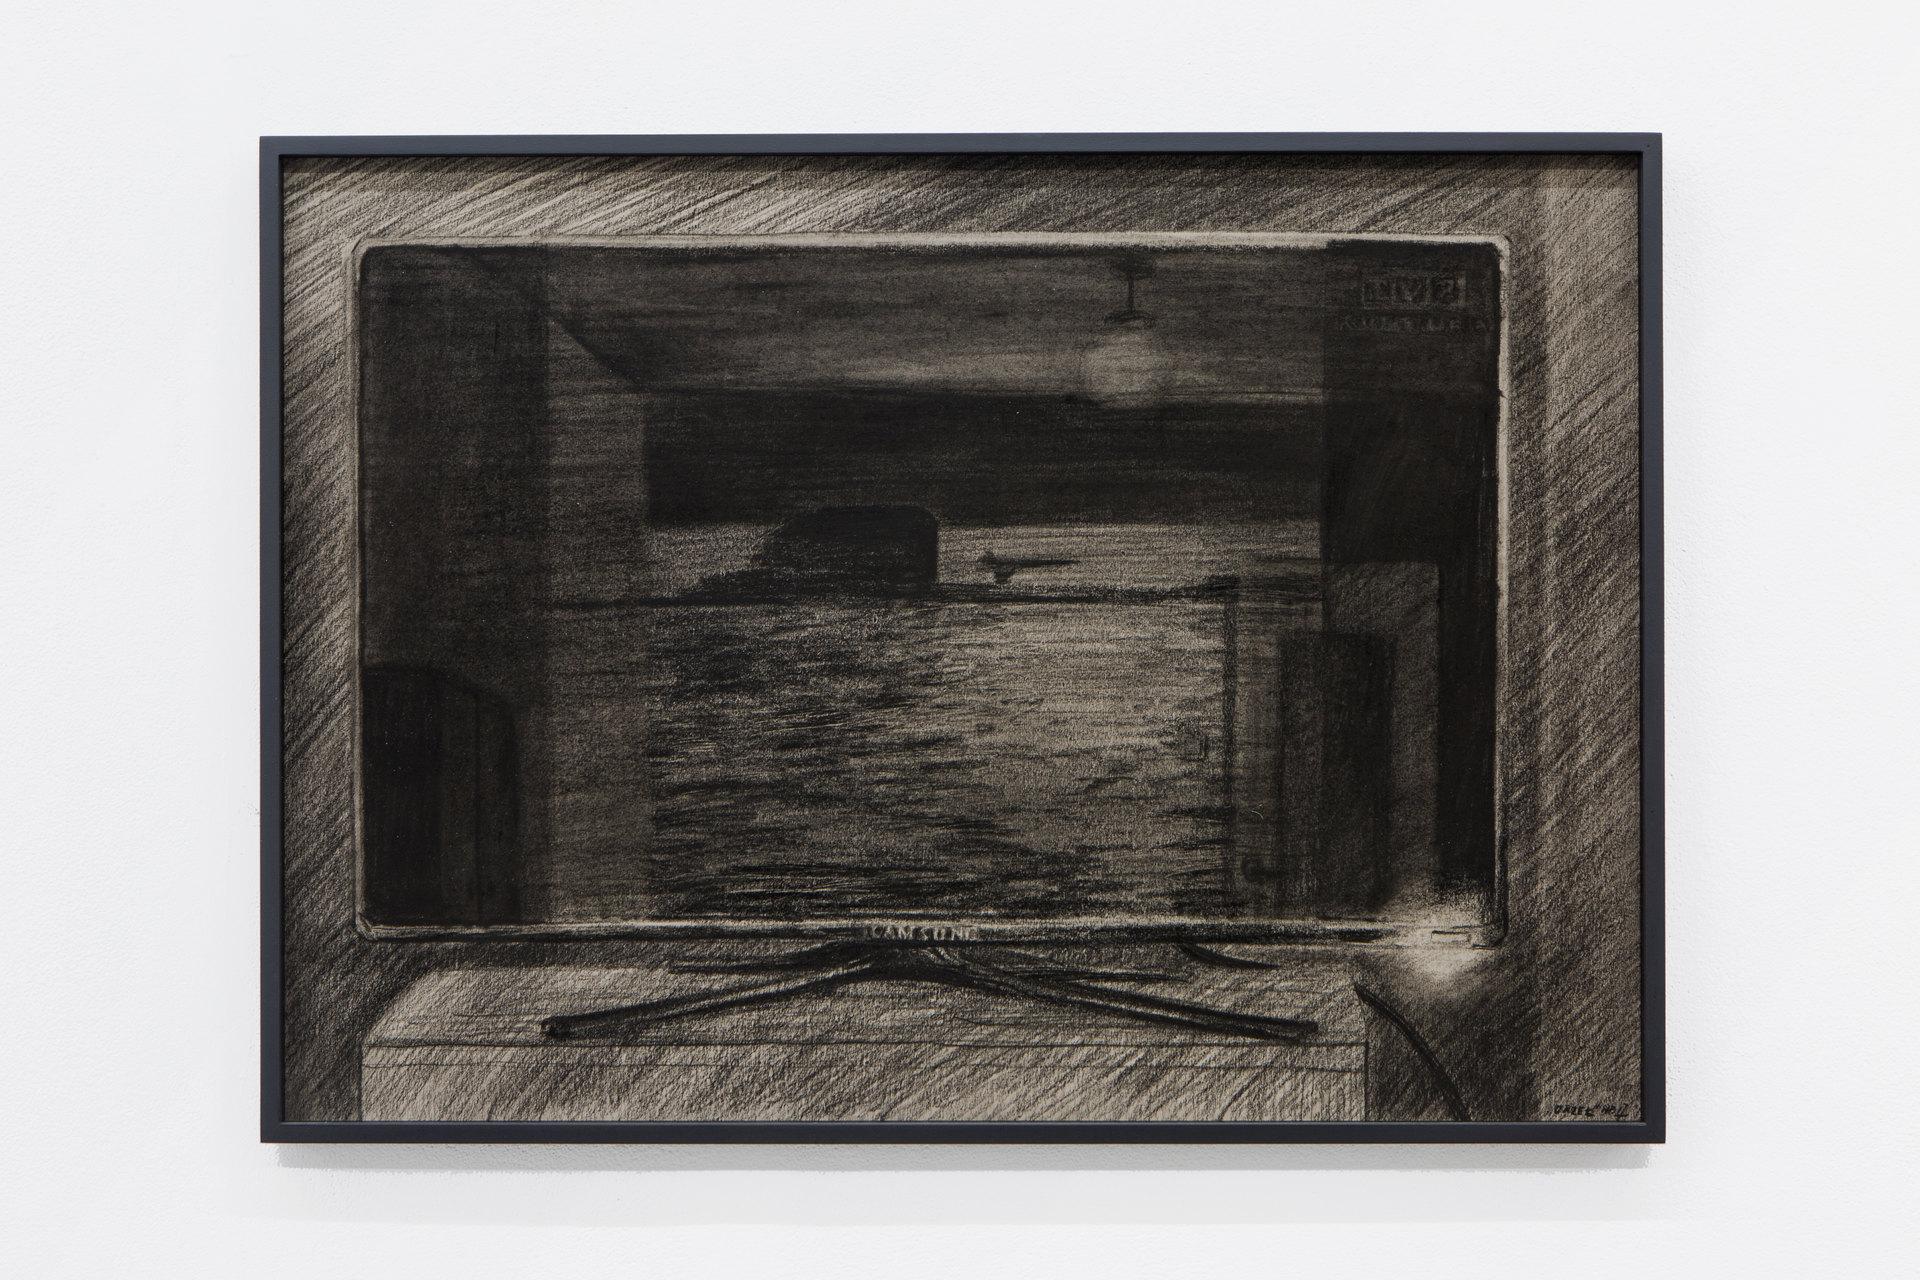 Wojciech Bakowski 'TV Afterimages', 2017, No, No, No, No, 2018 Cell Project Space